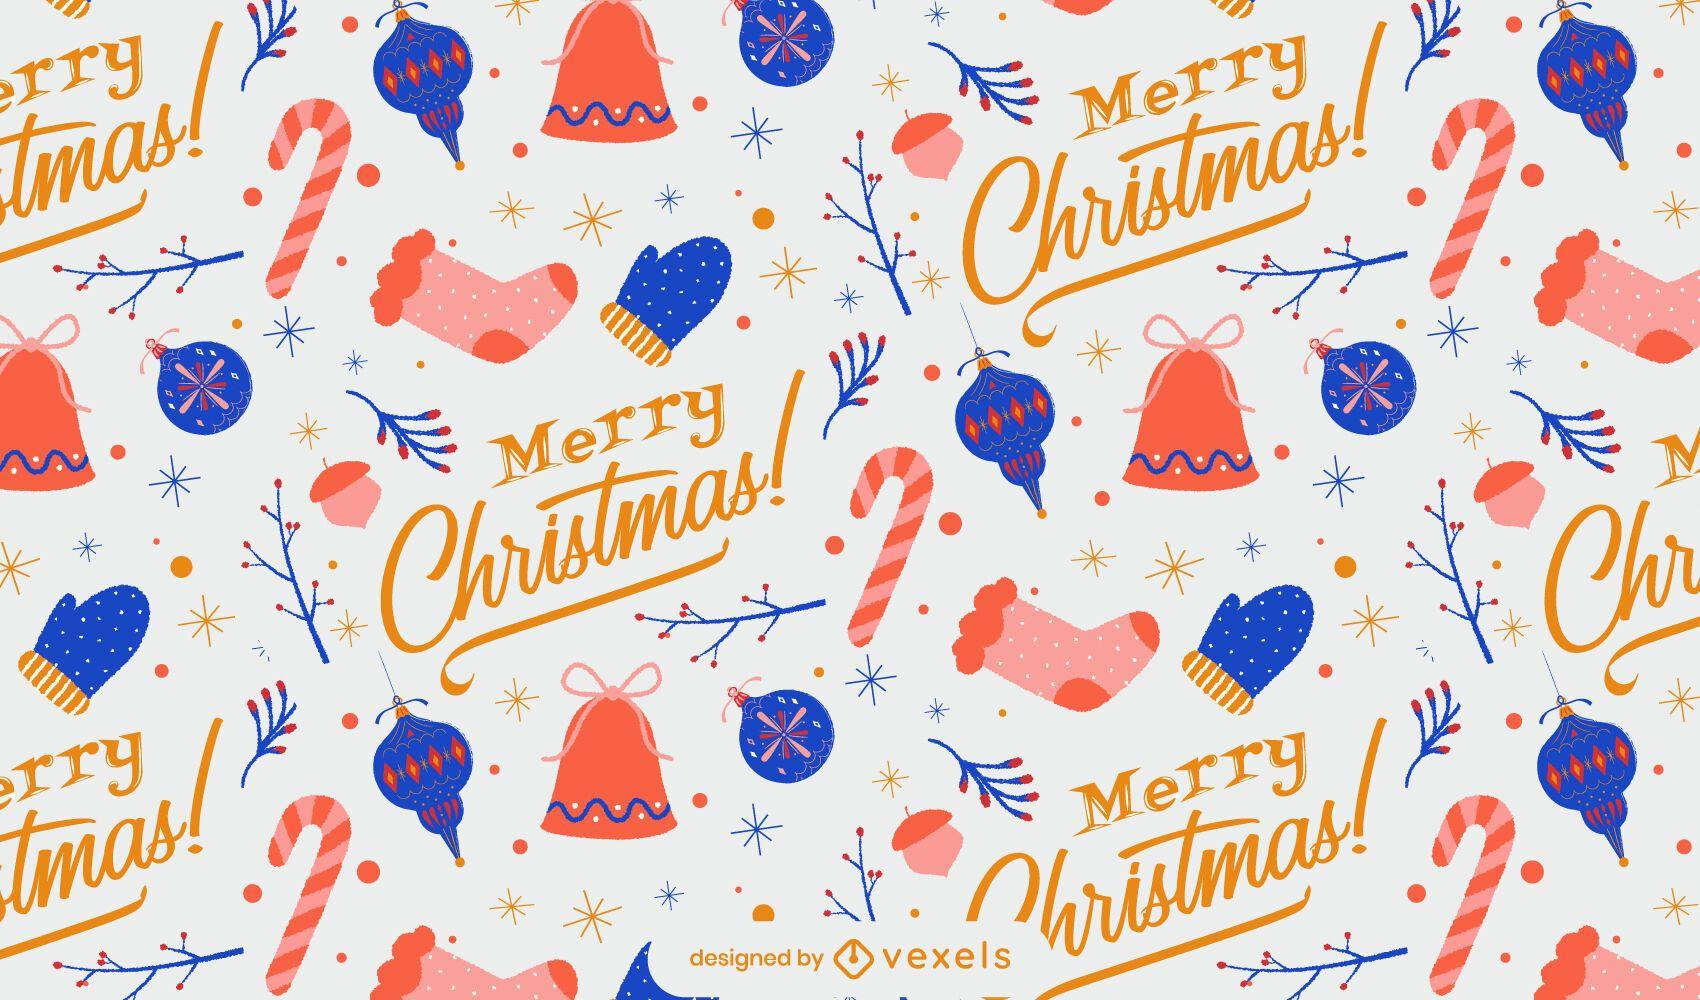 Merry christmas winter pattern design